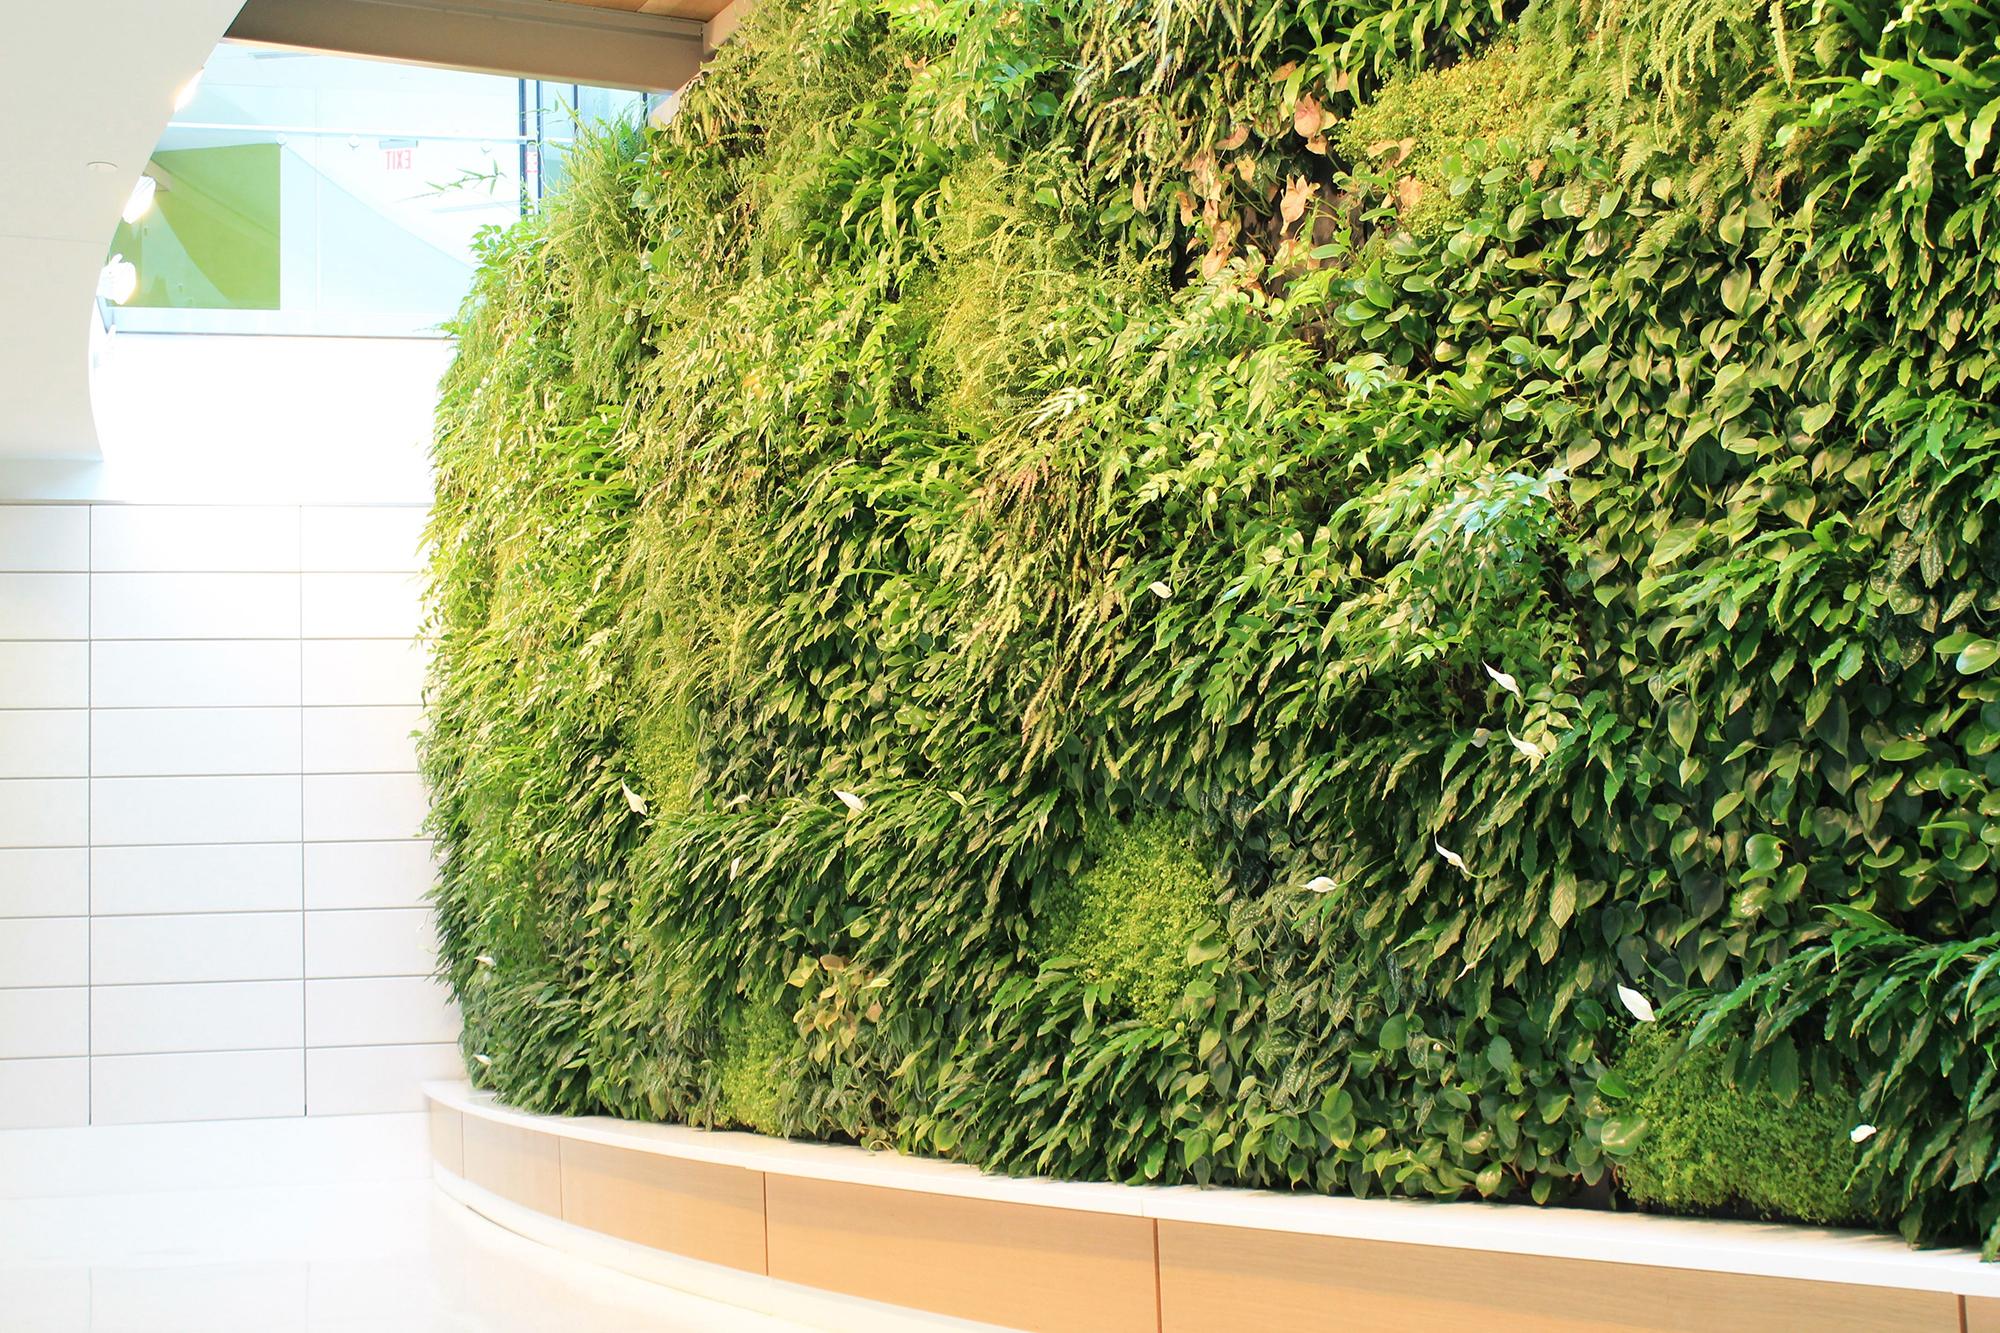 Lush living green eco wall inside a building's lobby.